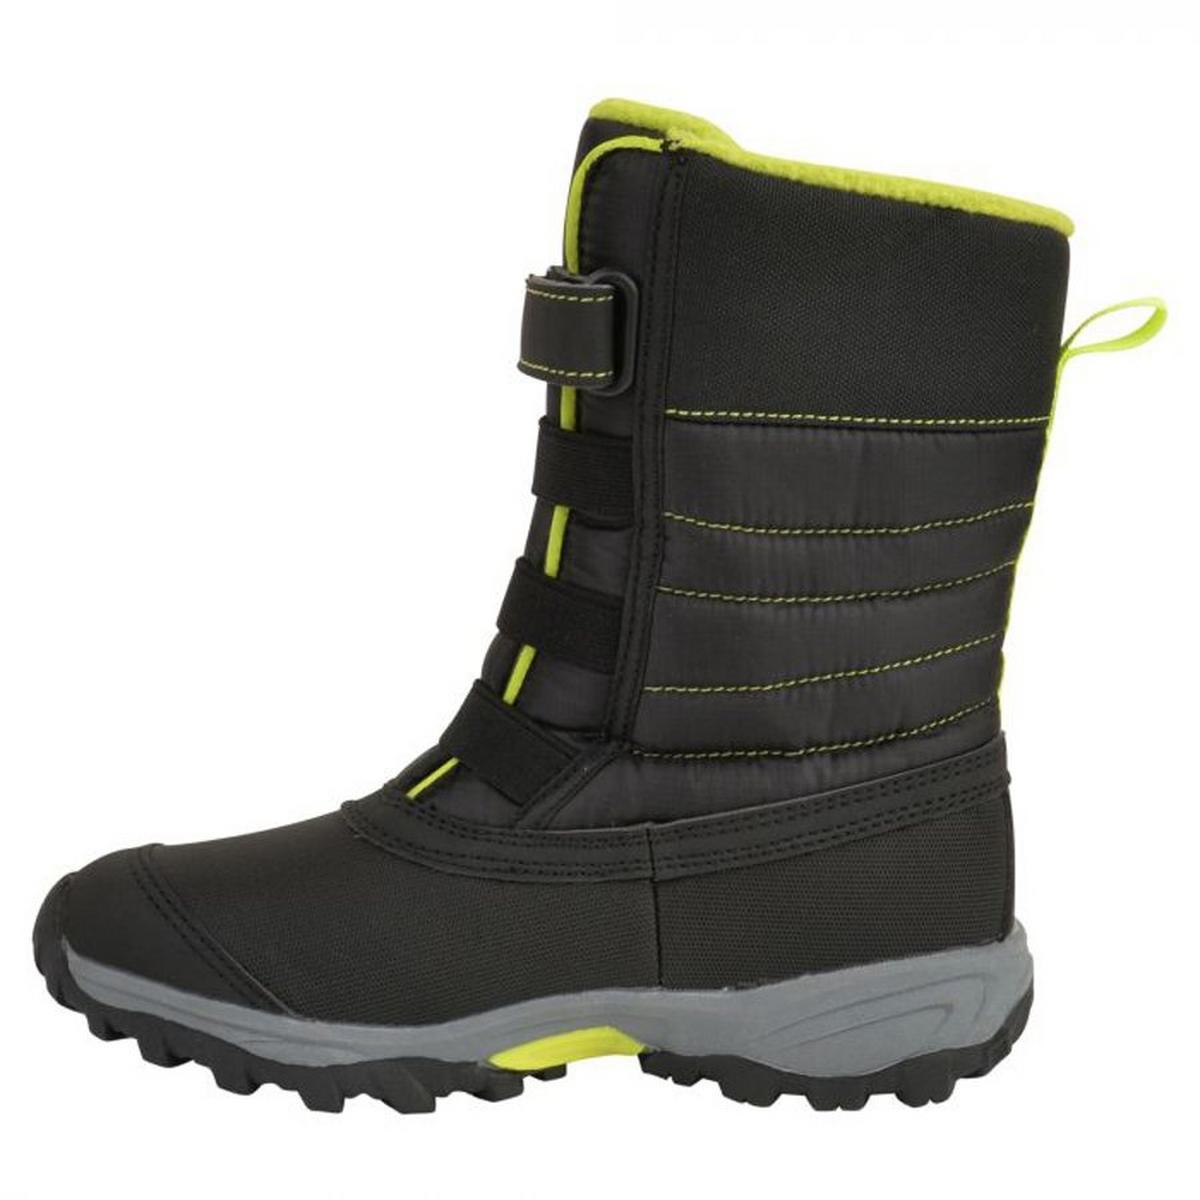 Dare 2 B Kids' Skiway II Junior Snow Boot